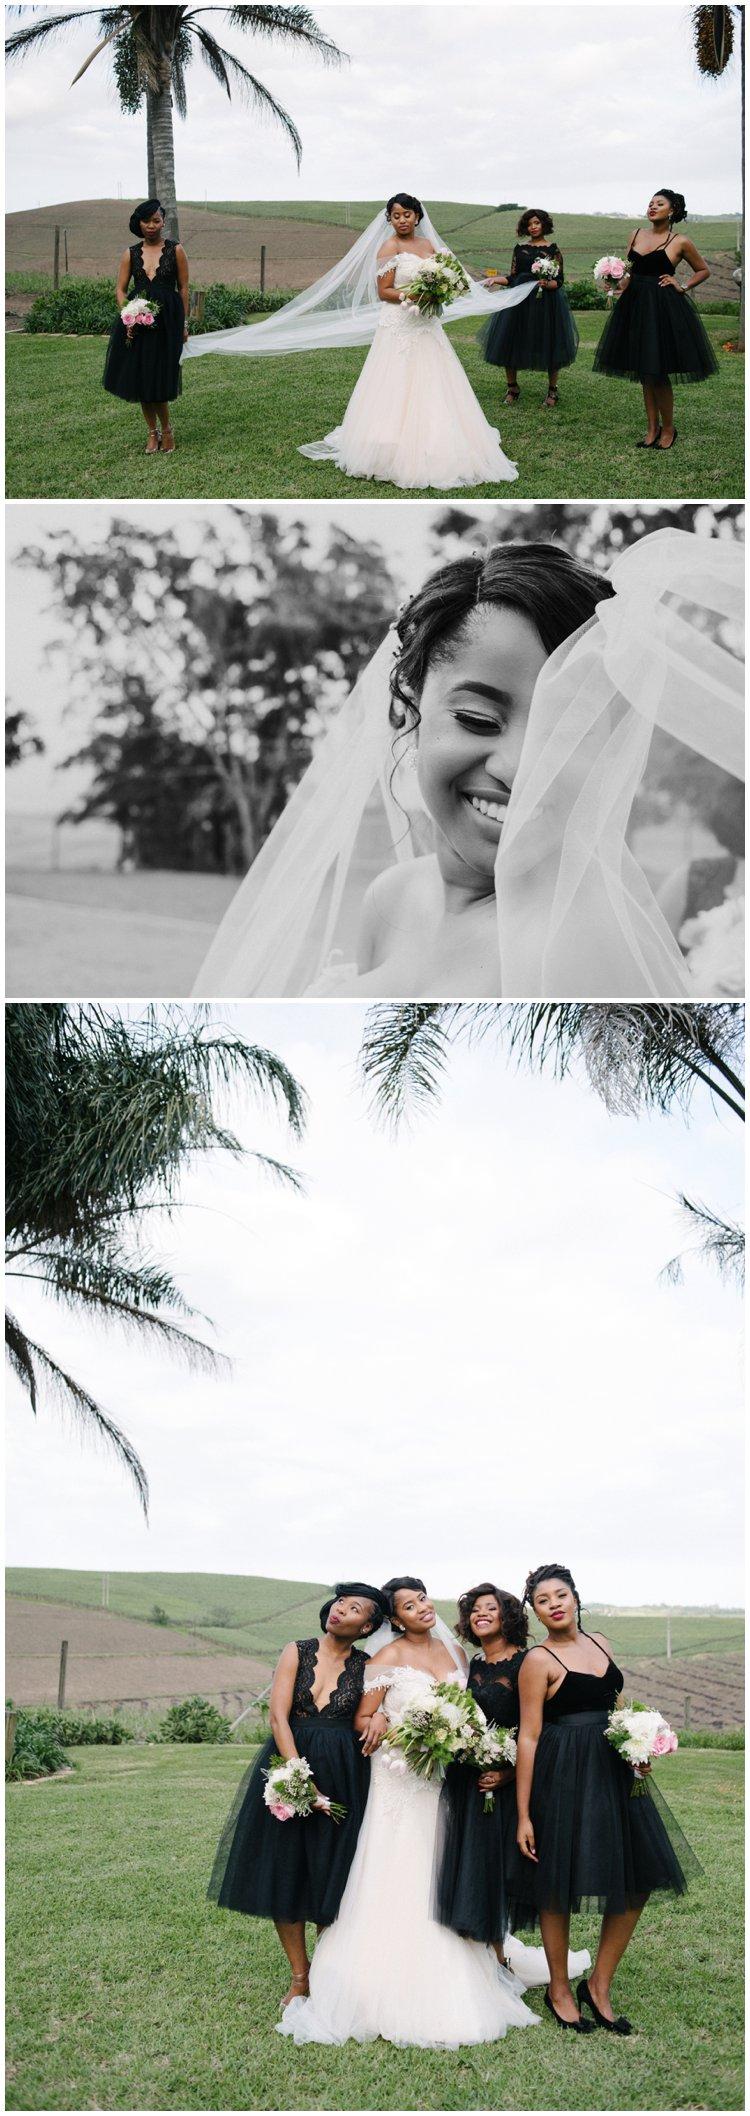 , {Love} Unscripted | Nandi & Imraan, Maroupi, Casey Pratt Photography